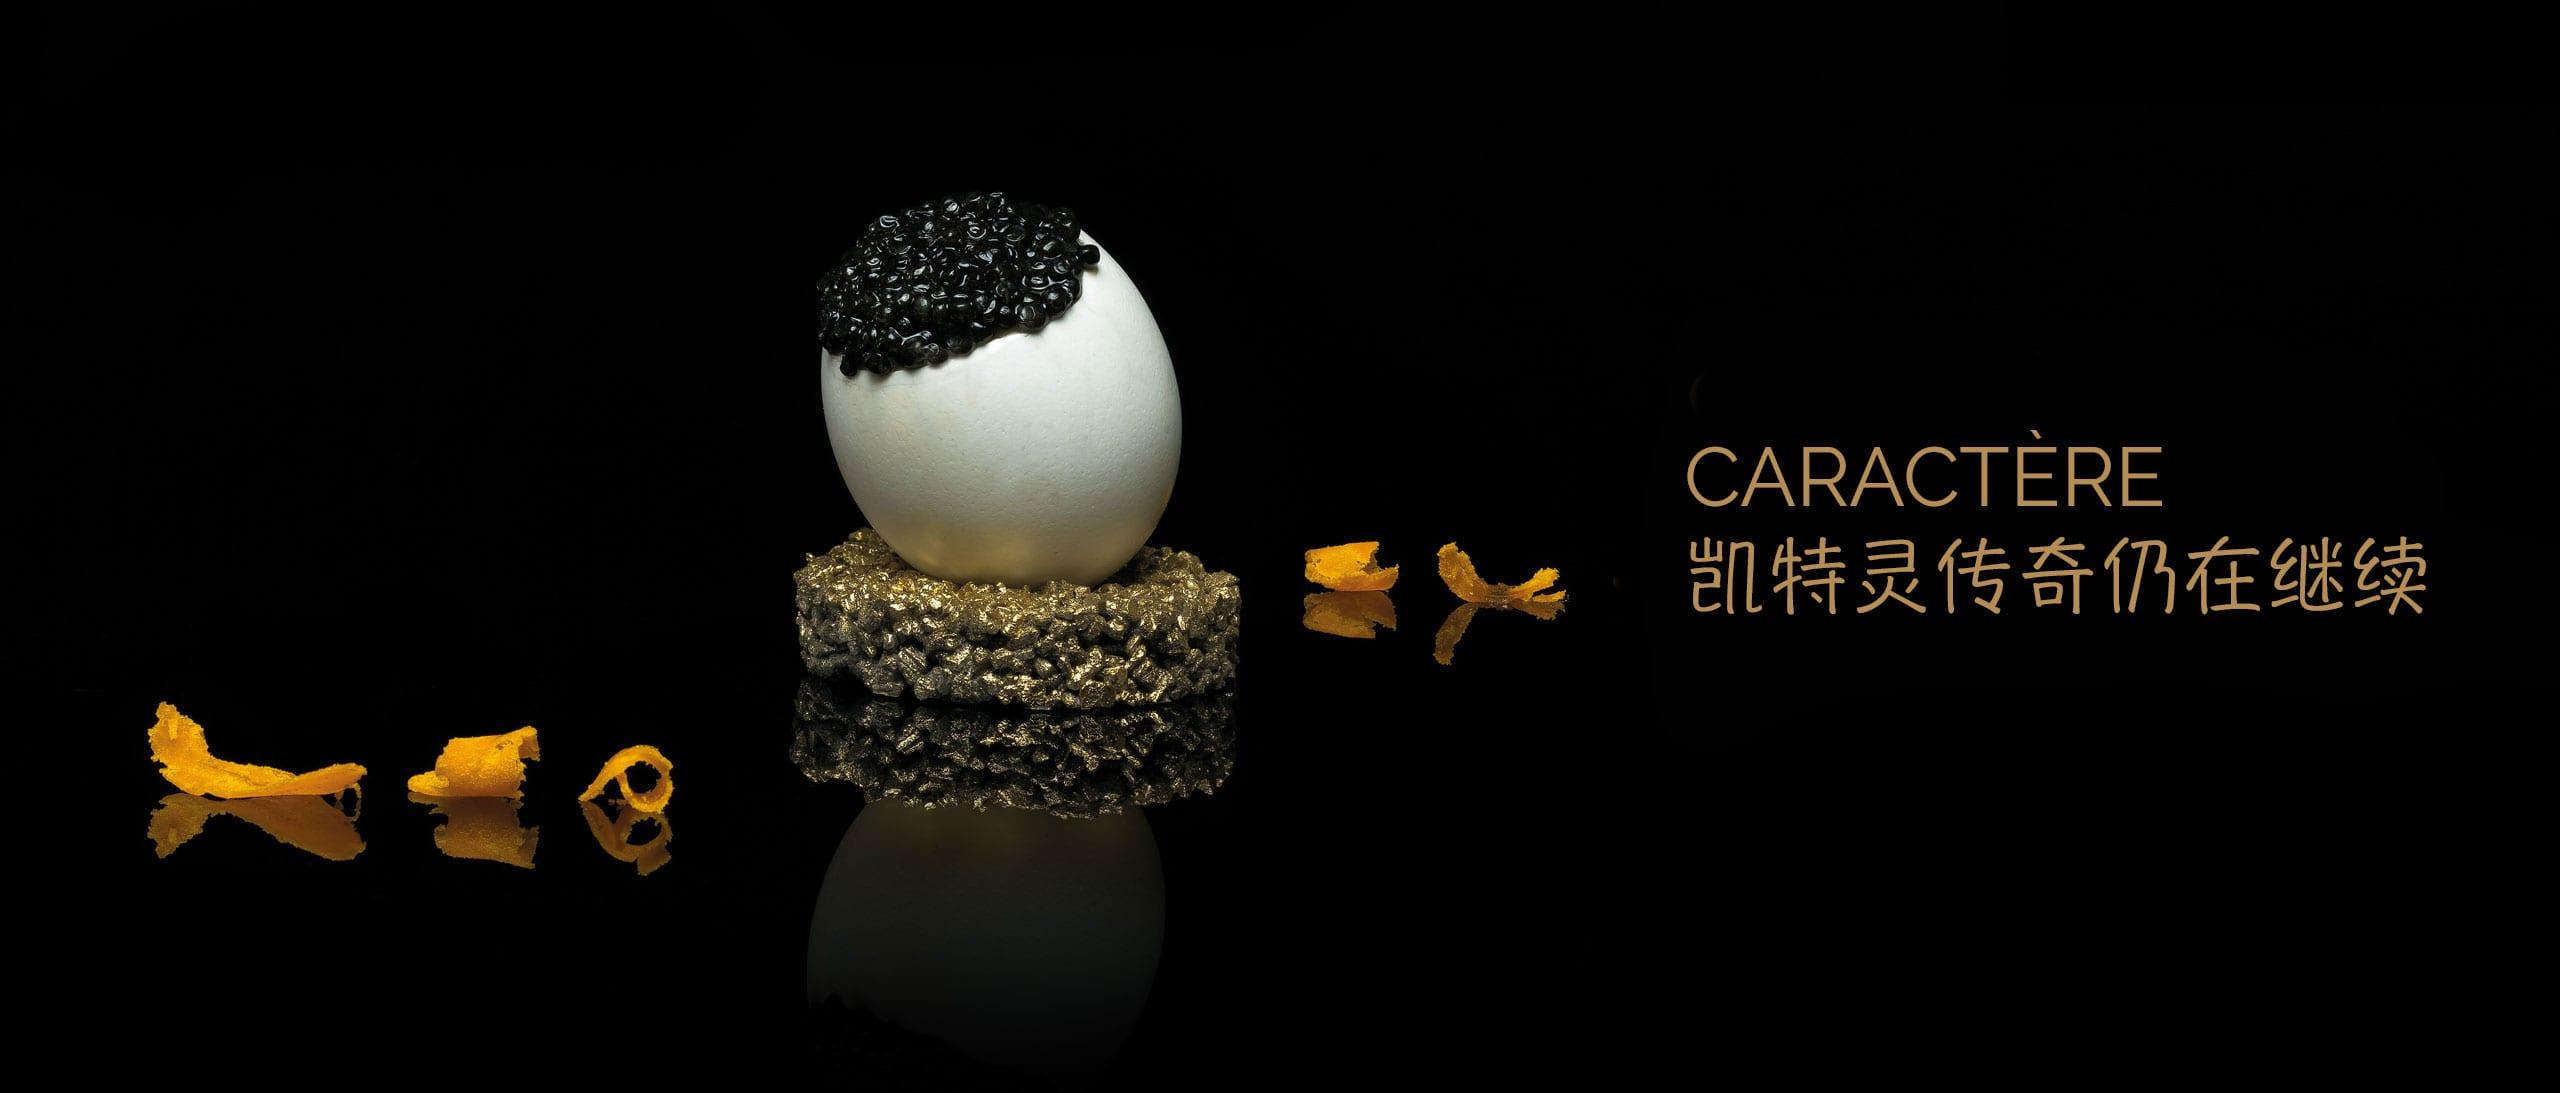 MOLTENI梦坦尼CARACTÈRE凯特灵系列